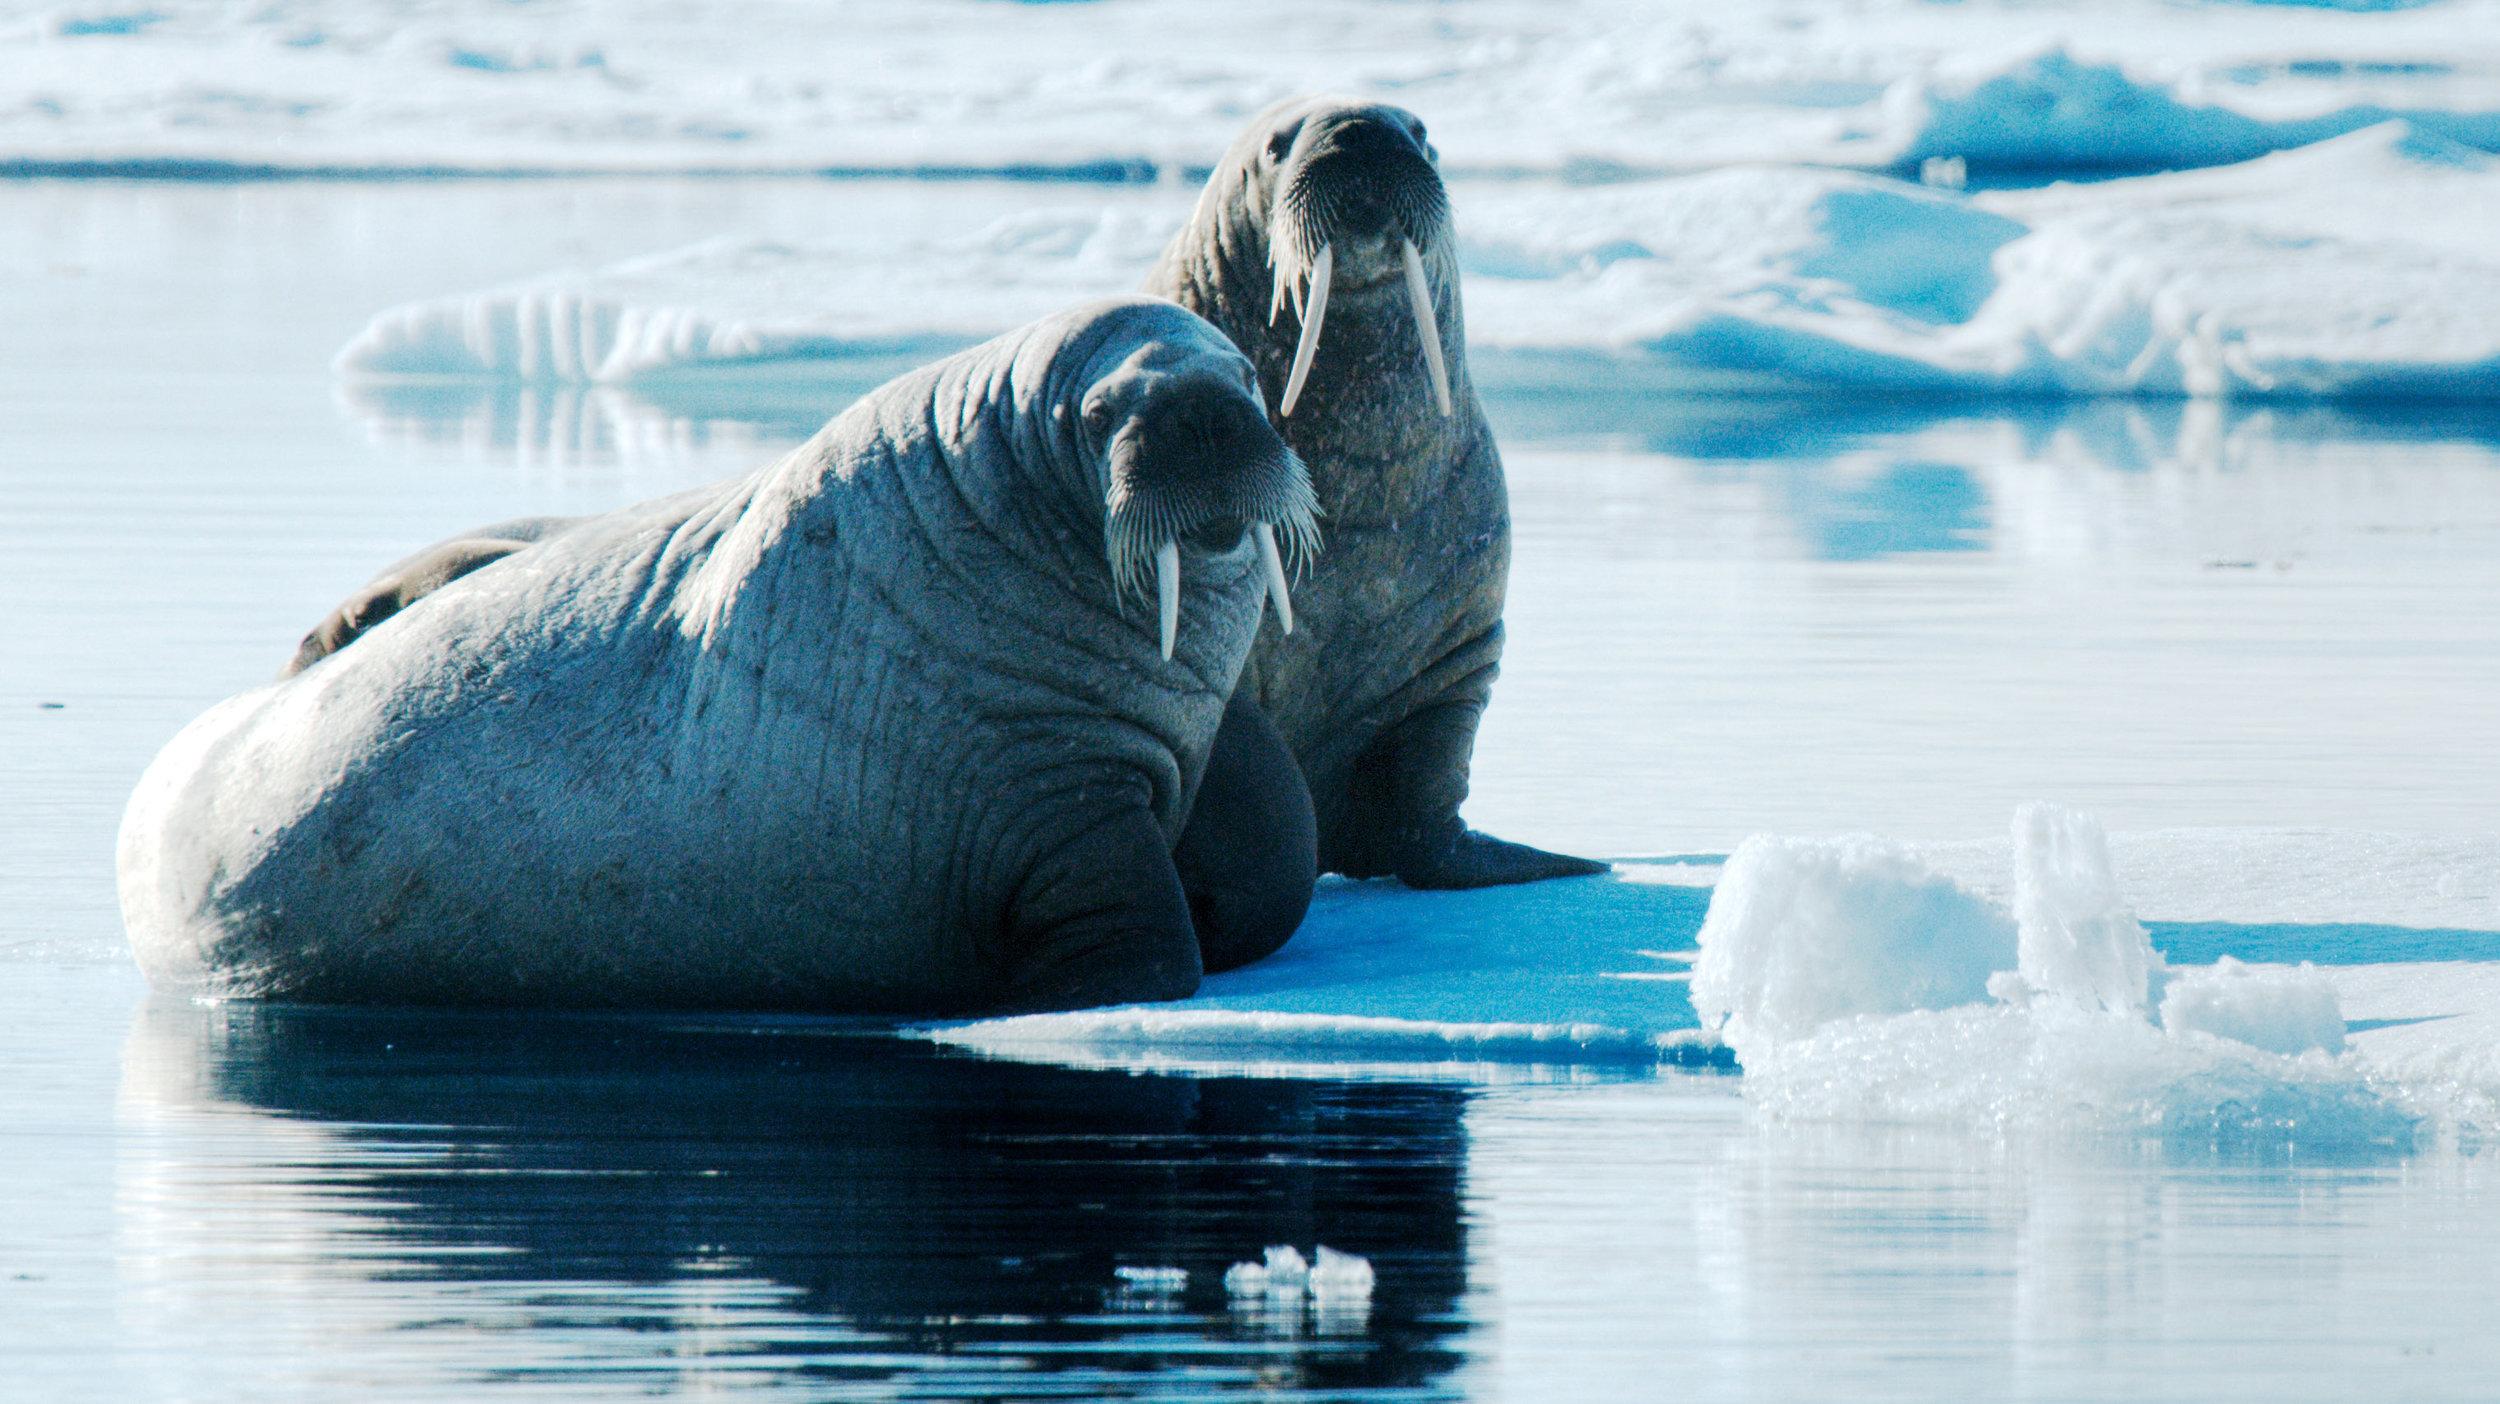 spitsbergen_walrus-(c)-Petr-Slavik-3.jpg_Petr-Slavik.jpg